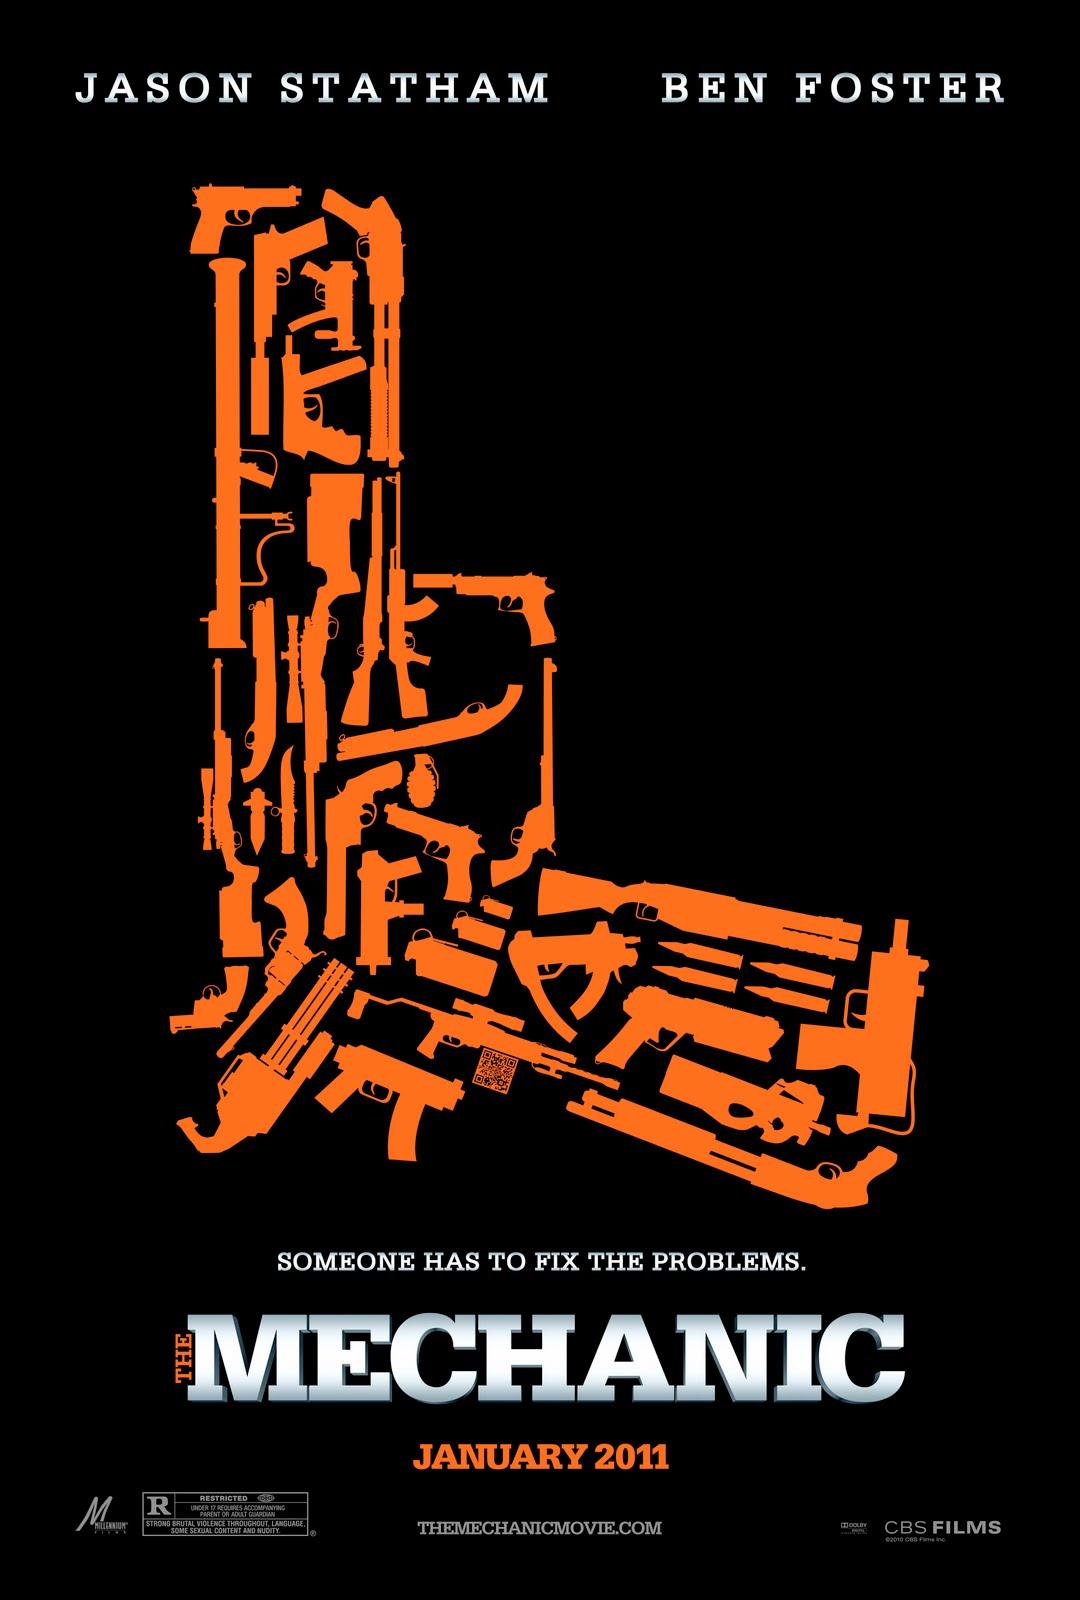 http://3.bp.blogspot.com/_8Gjr2U_ybyc/TUbCaCv26nI/AAAAAAAABTY/rcl21oQlPcw/s1600/the_mechanic_movie_poster_01.jpg